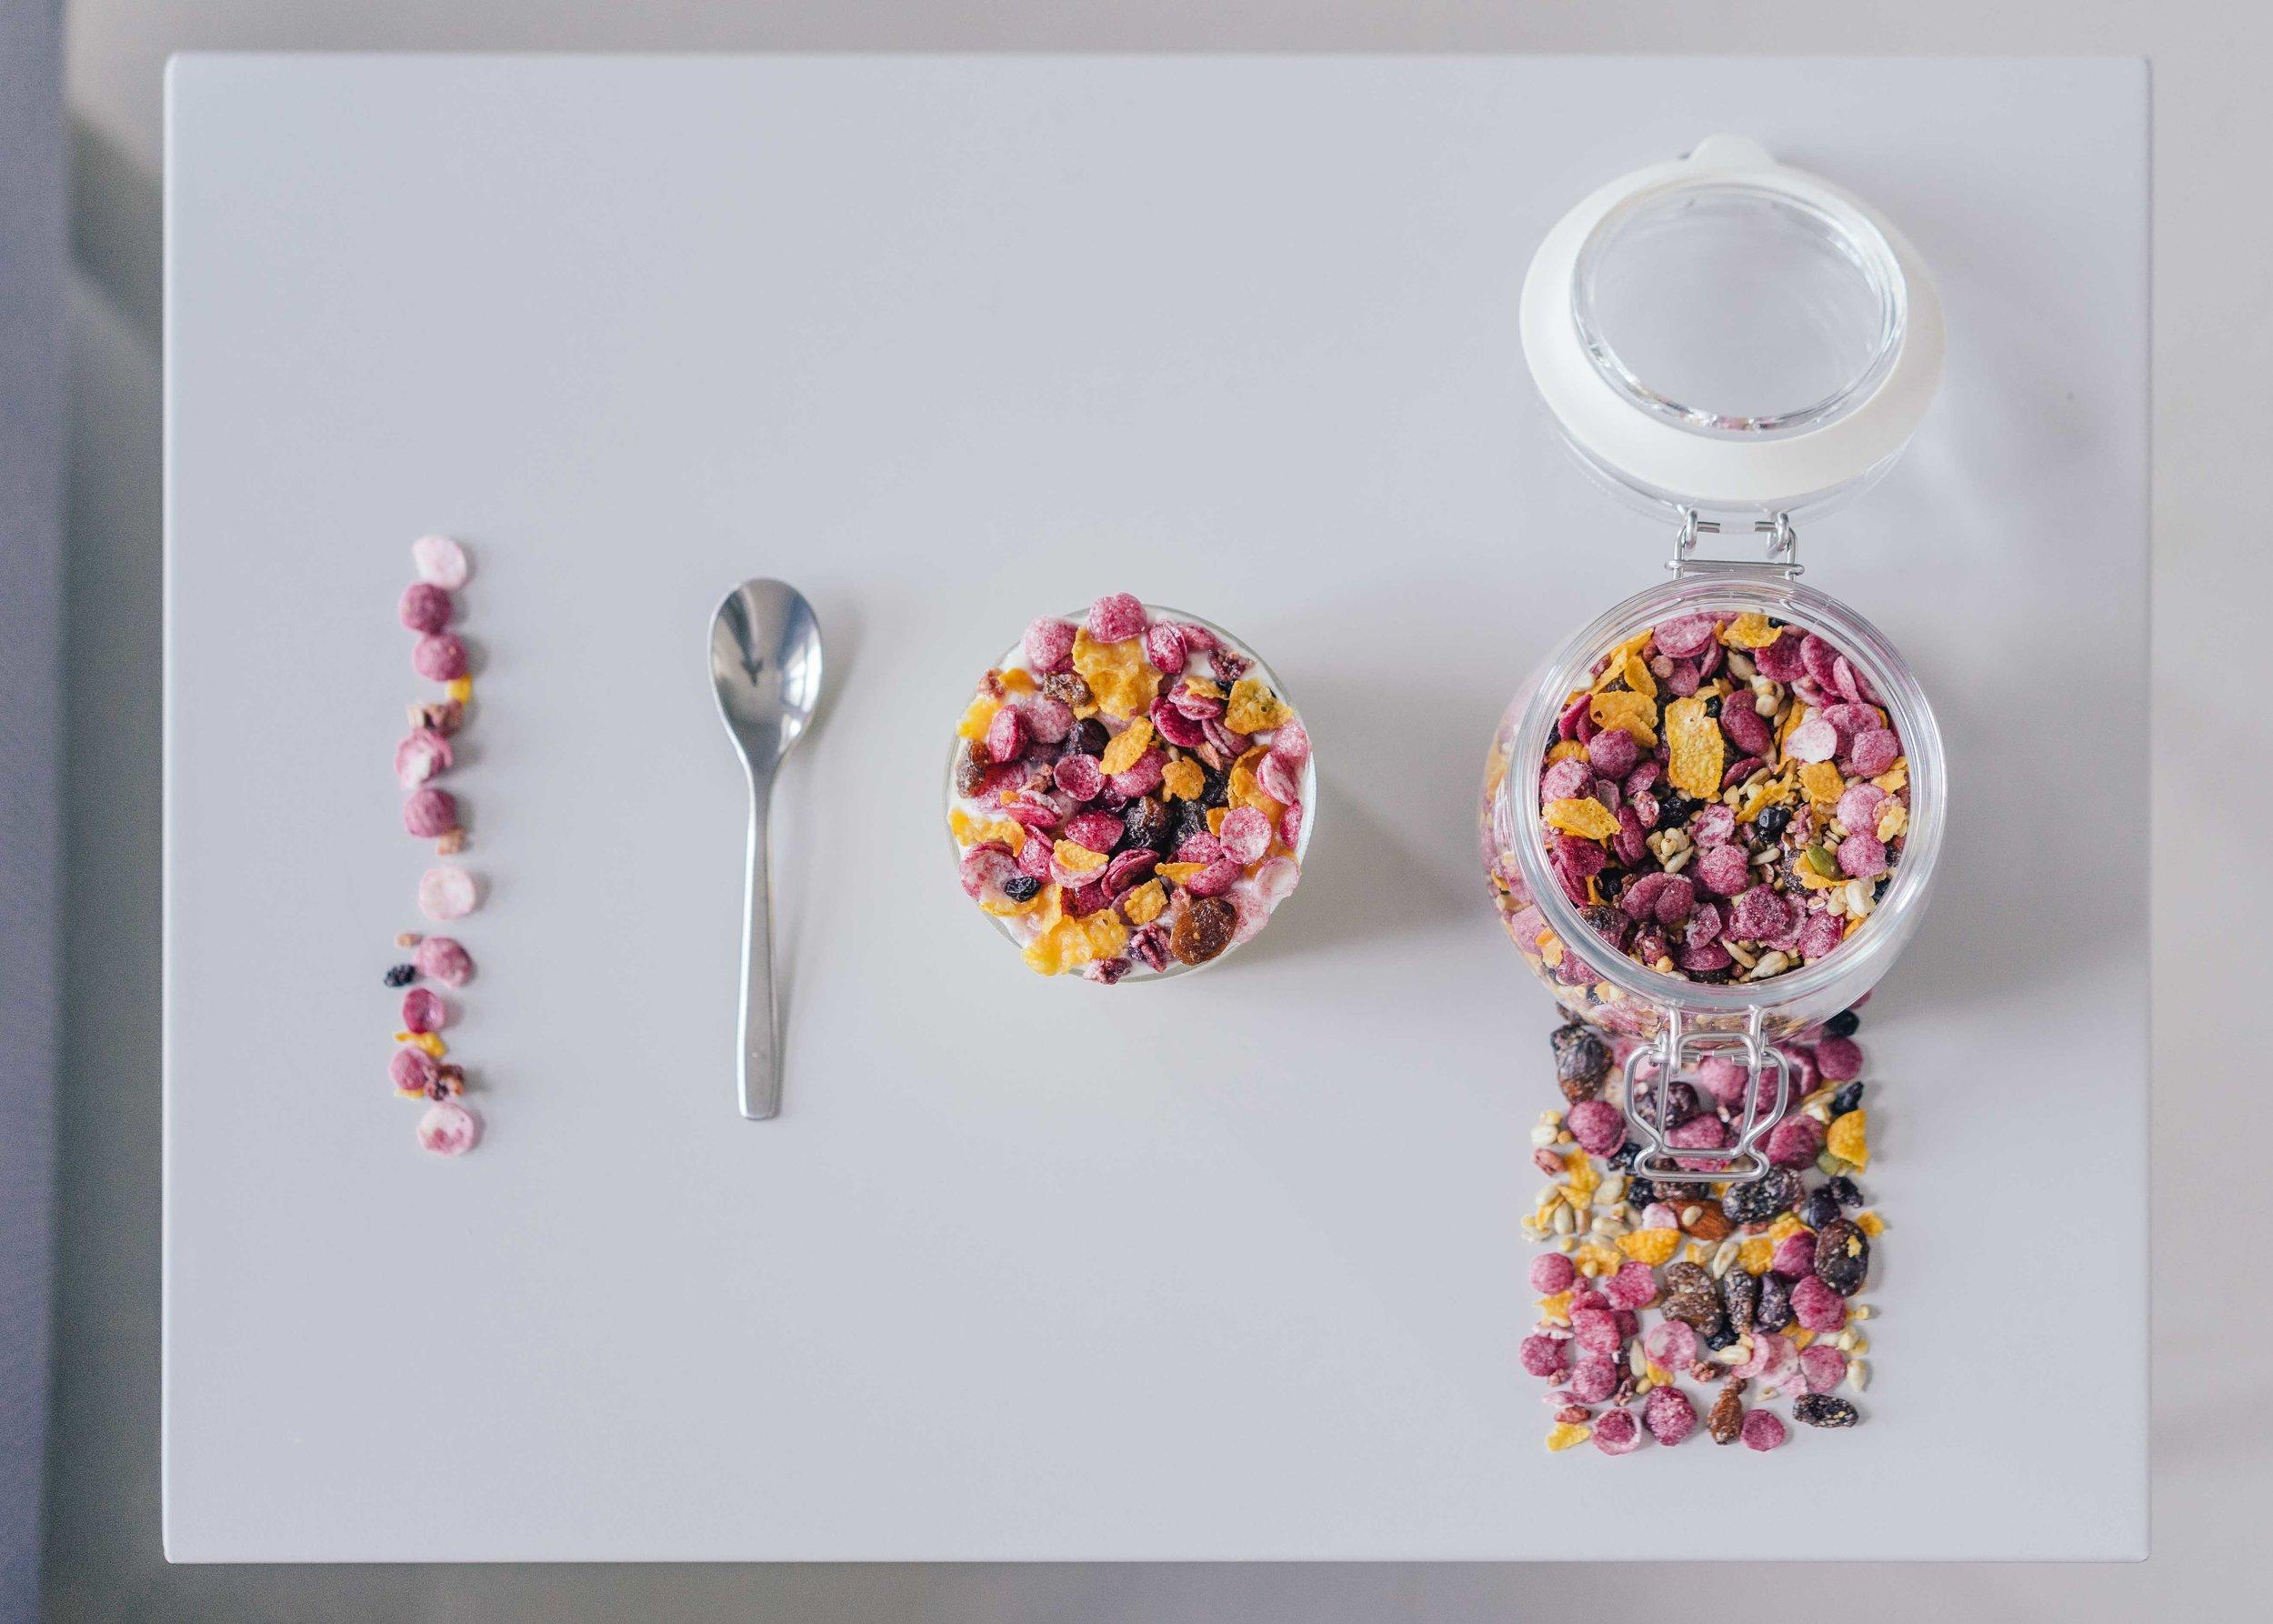 rice-and-shine-blog-quaker-granola-2018-06-04-13.jpg